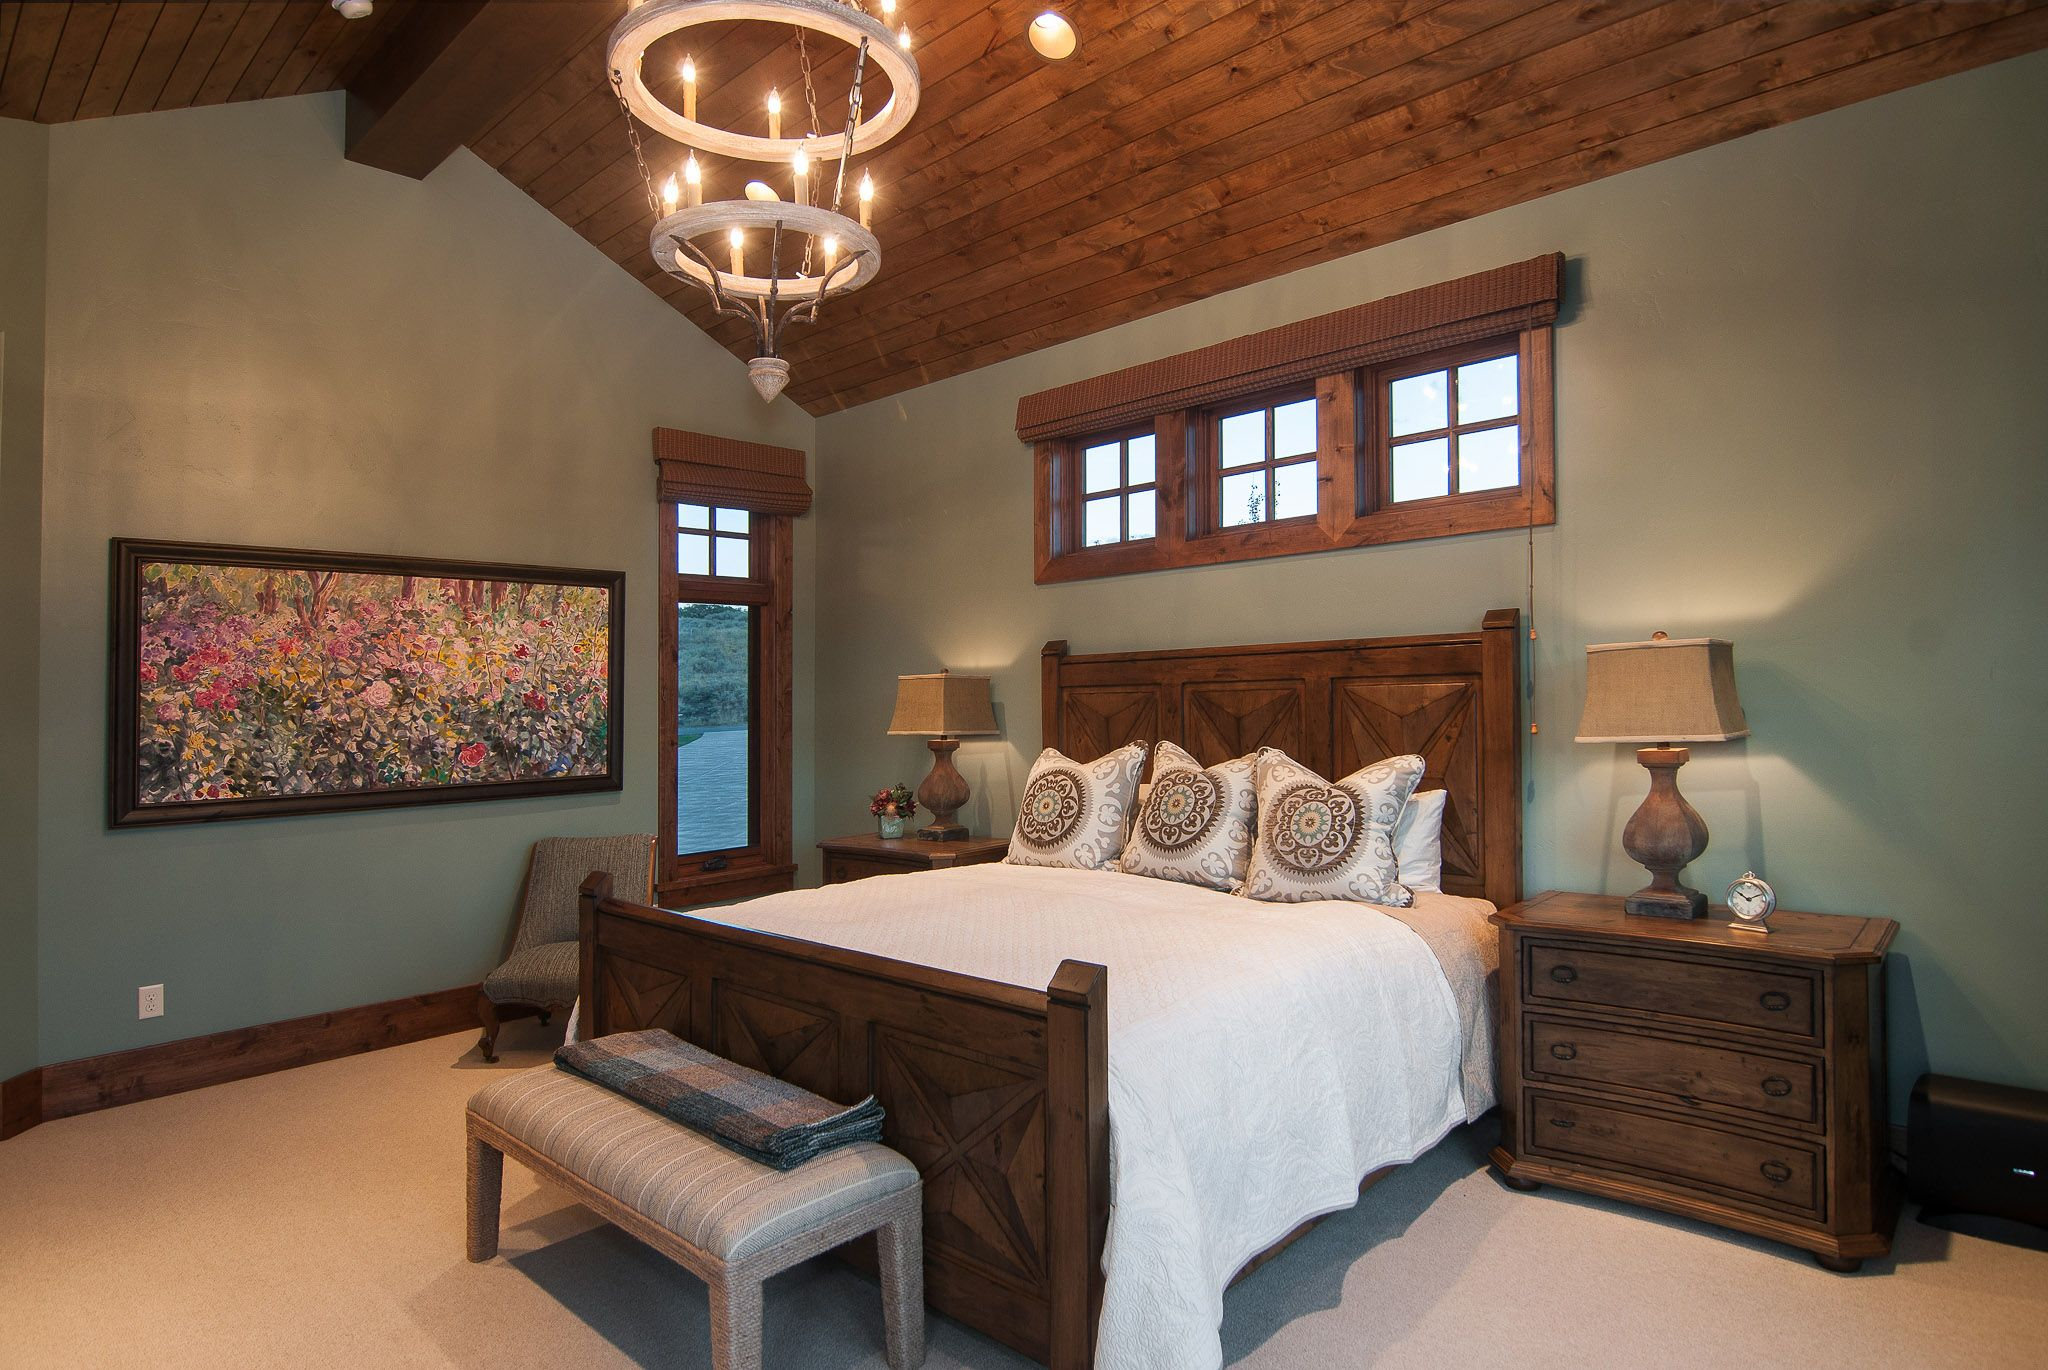 Master bedroom bedroom ceiling decor  Master Bedroom Home built by Cameo Homes Inc in Utah  Bedrooms